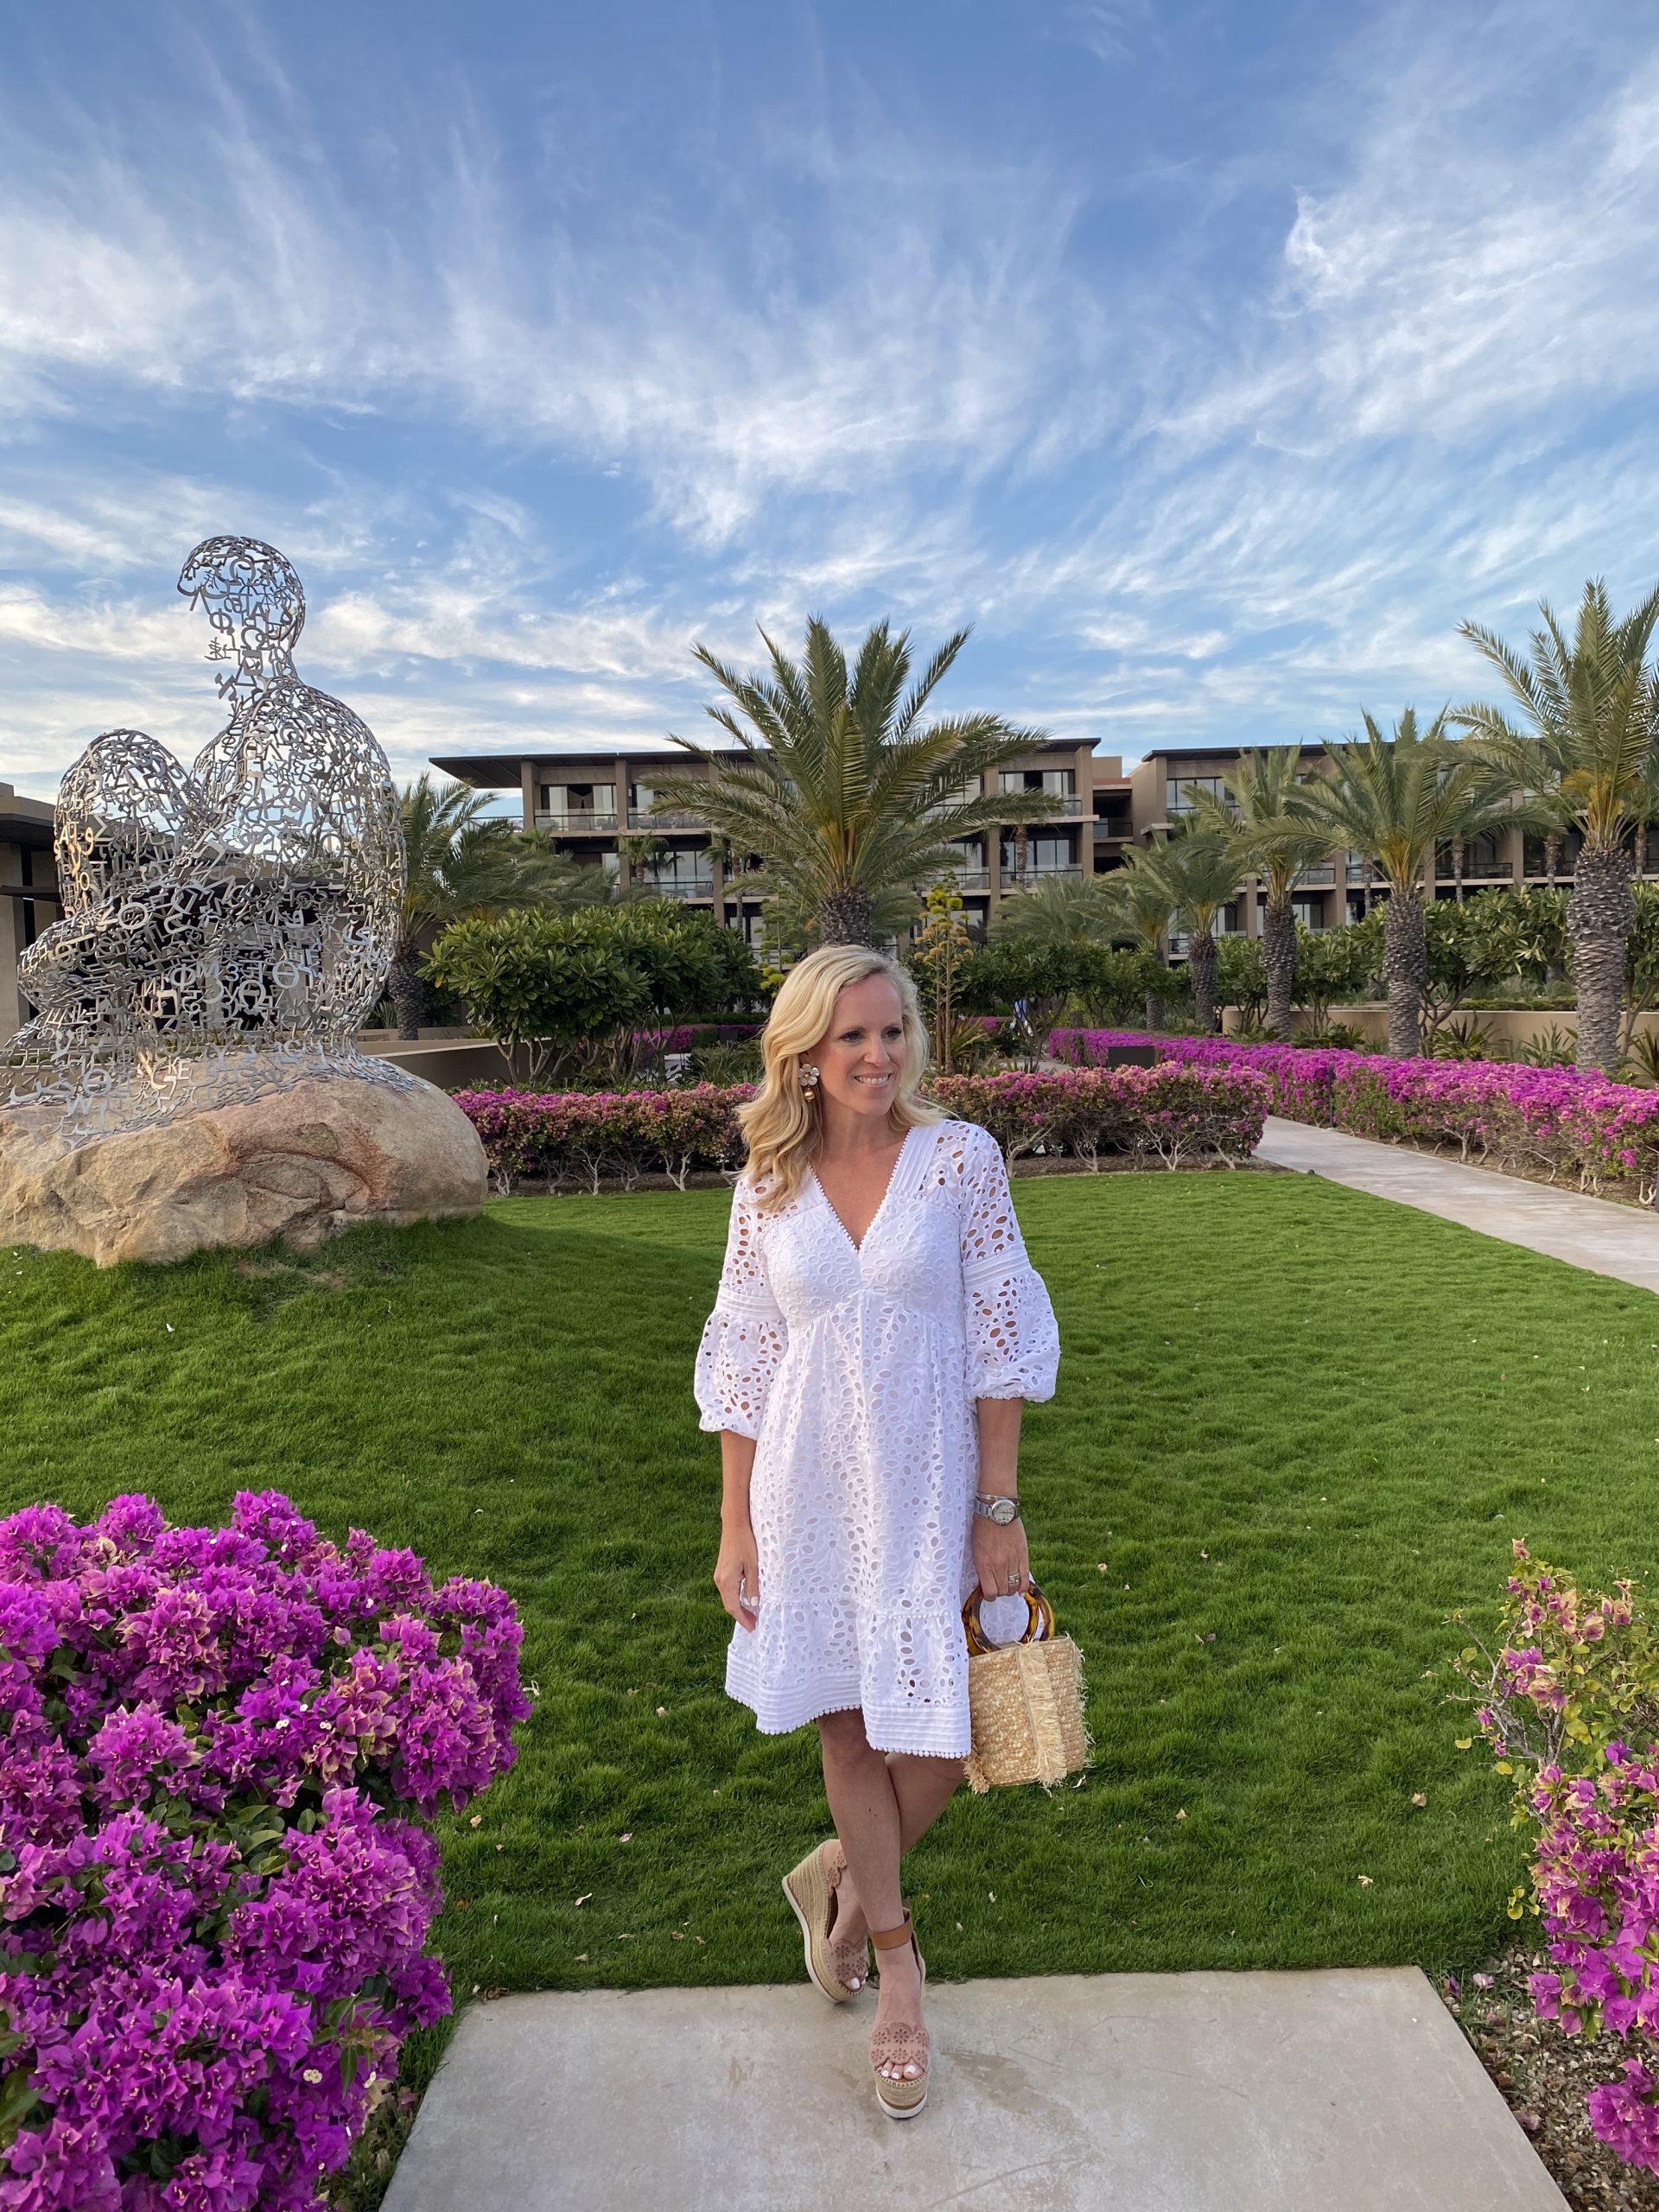 woman in white dress standing in garden